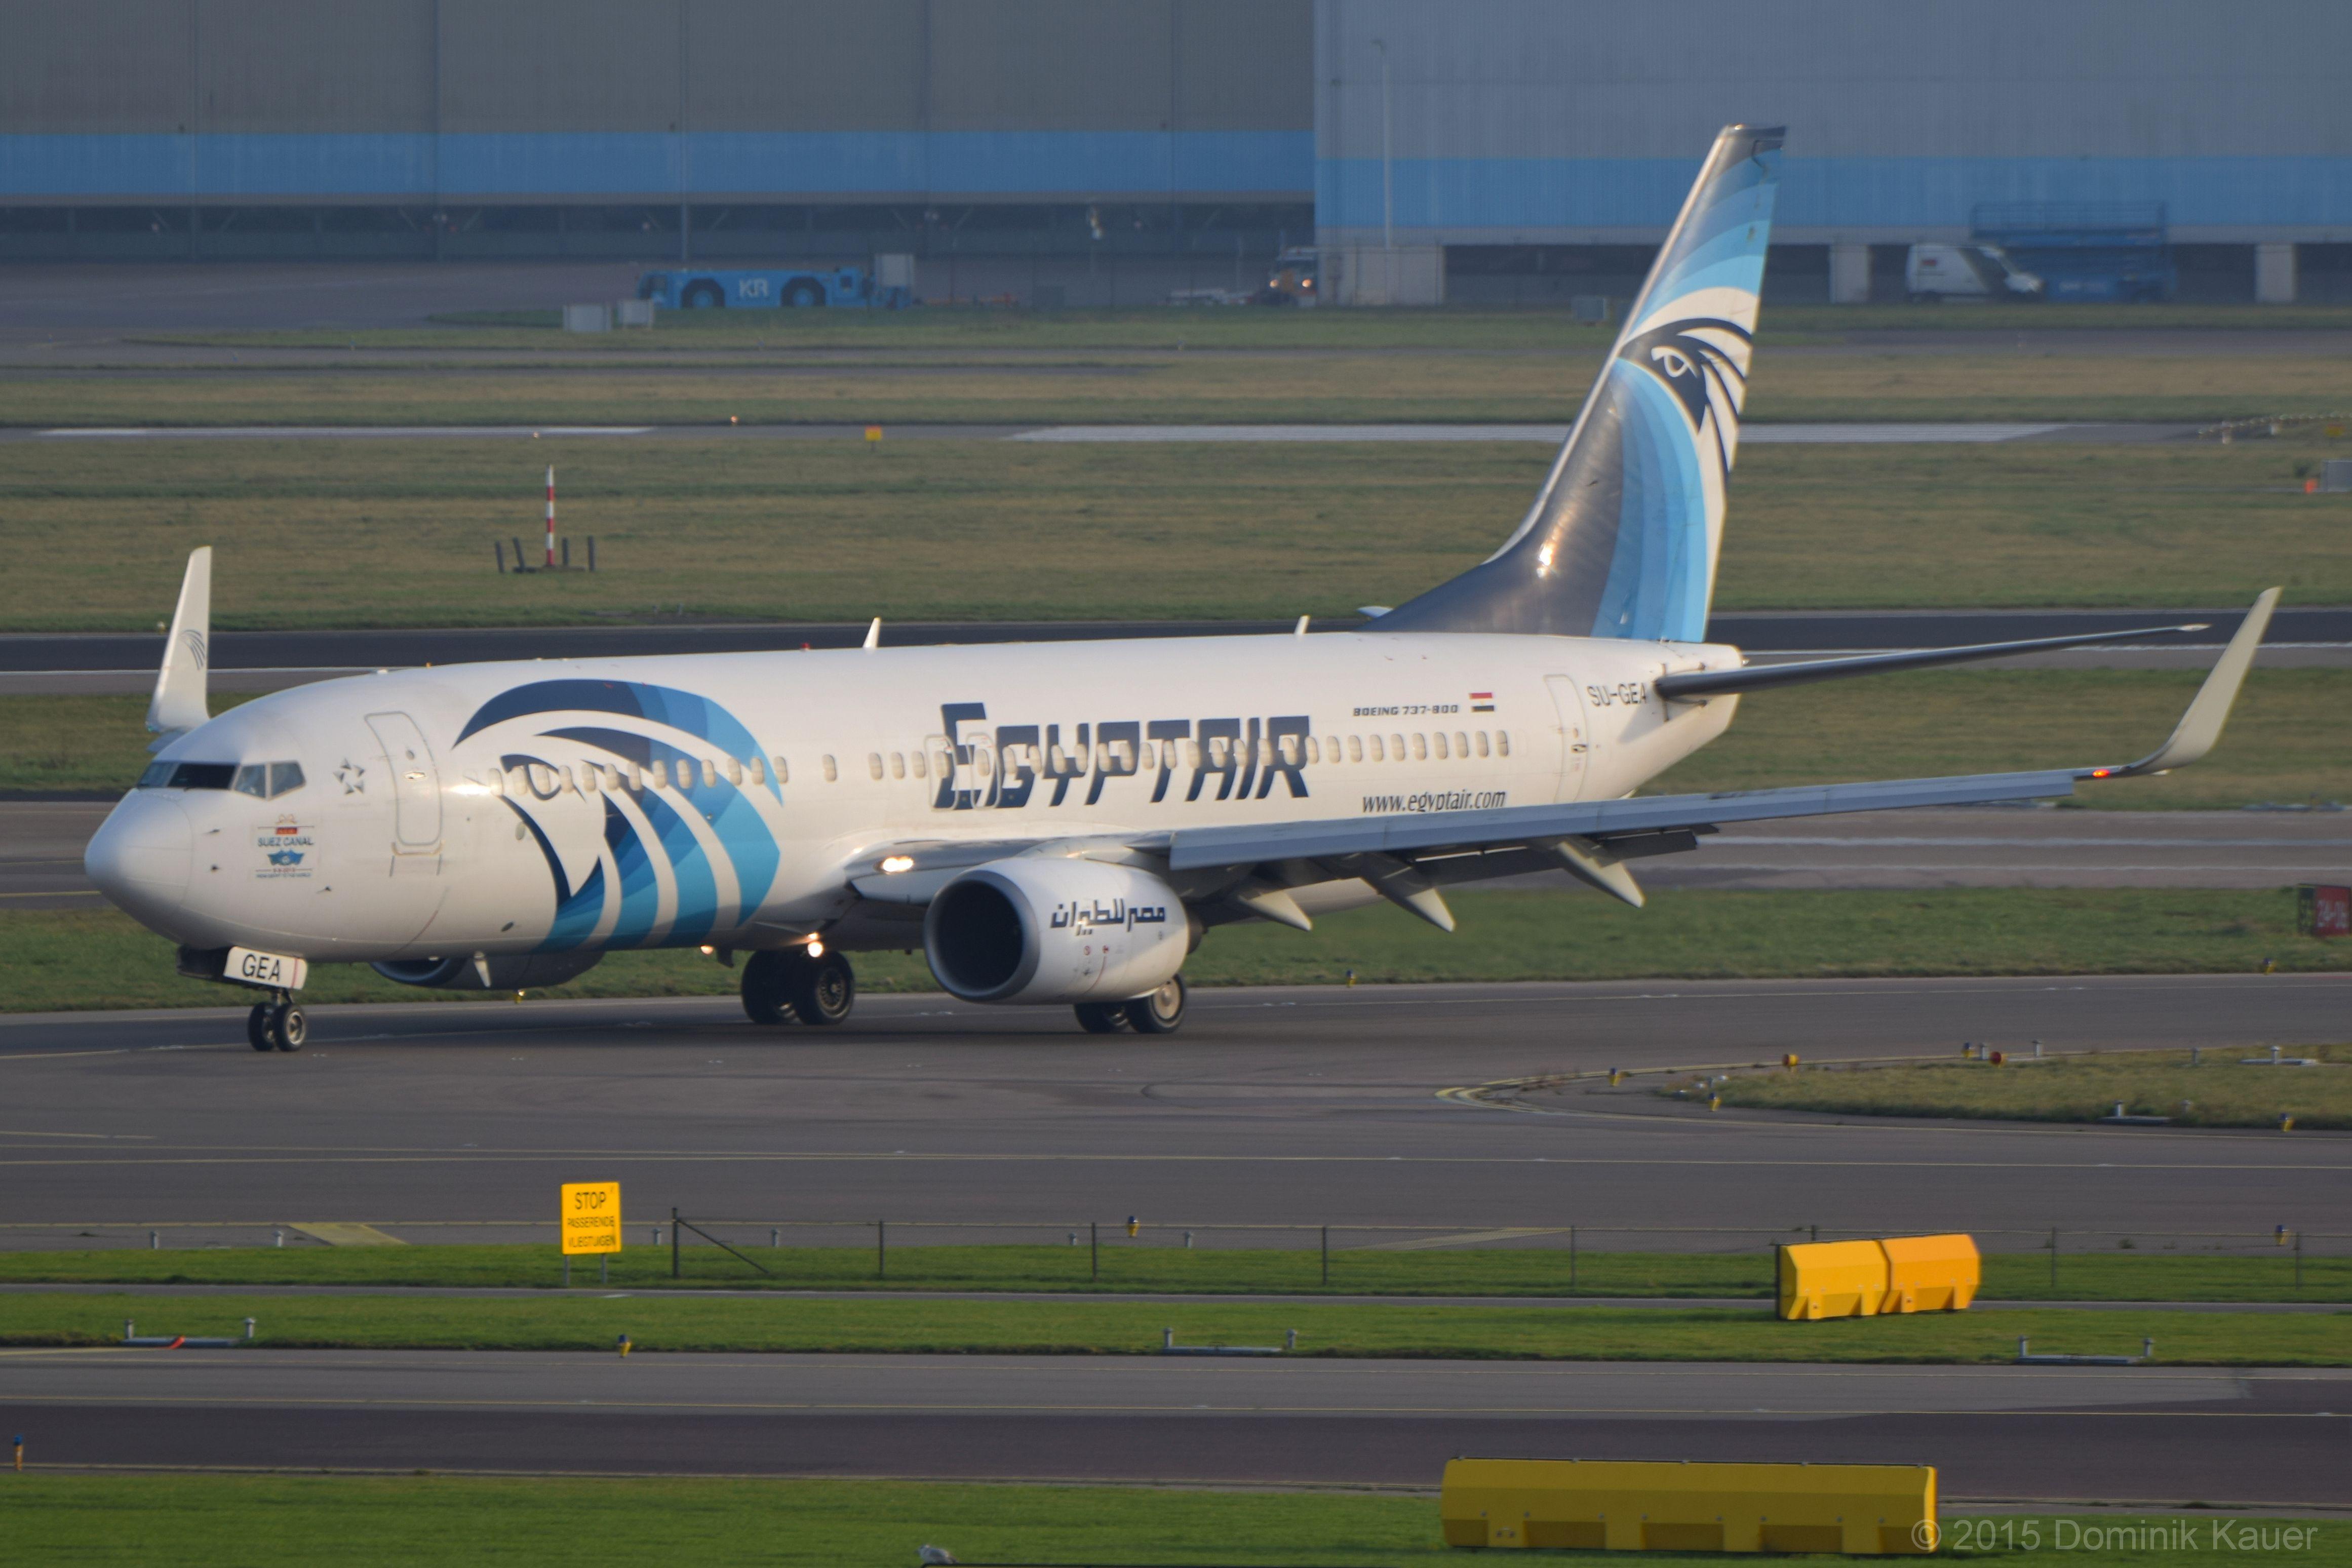 File:EgyptAir Boeing 737-866 (W) - SU-GEA - AMS